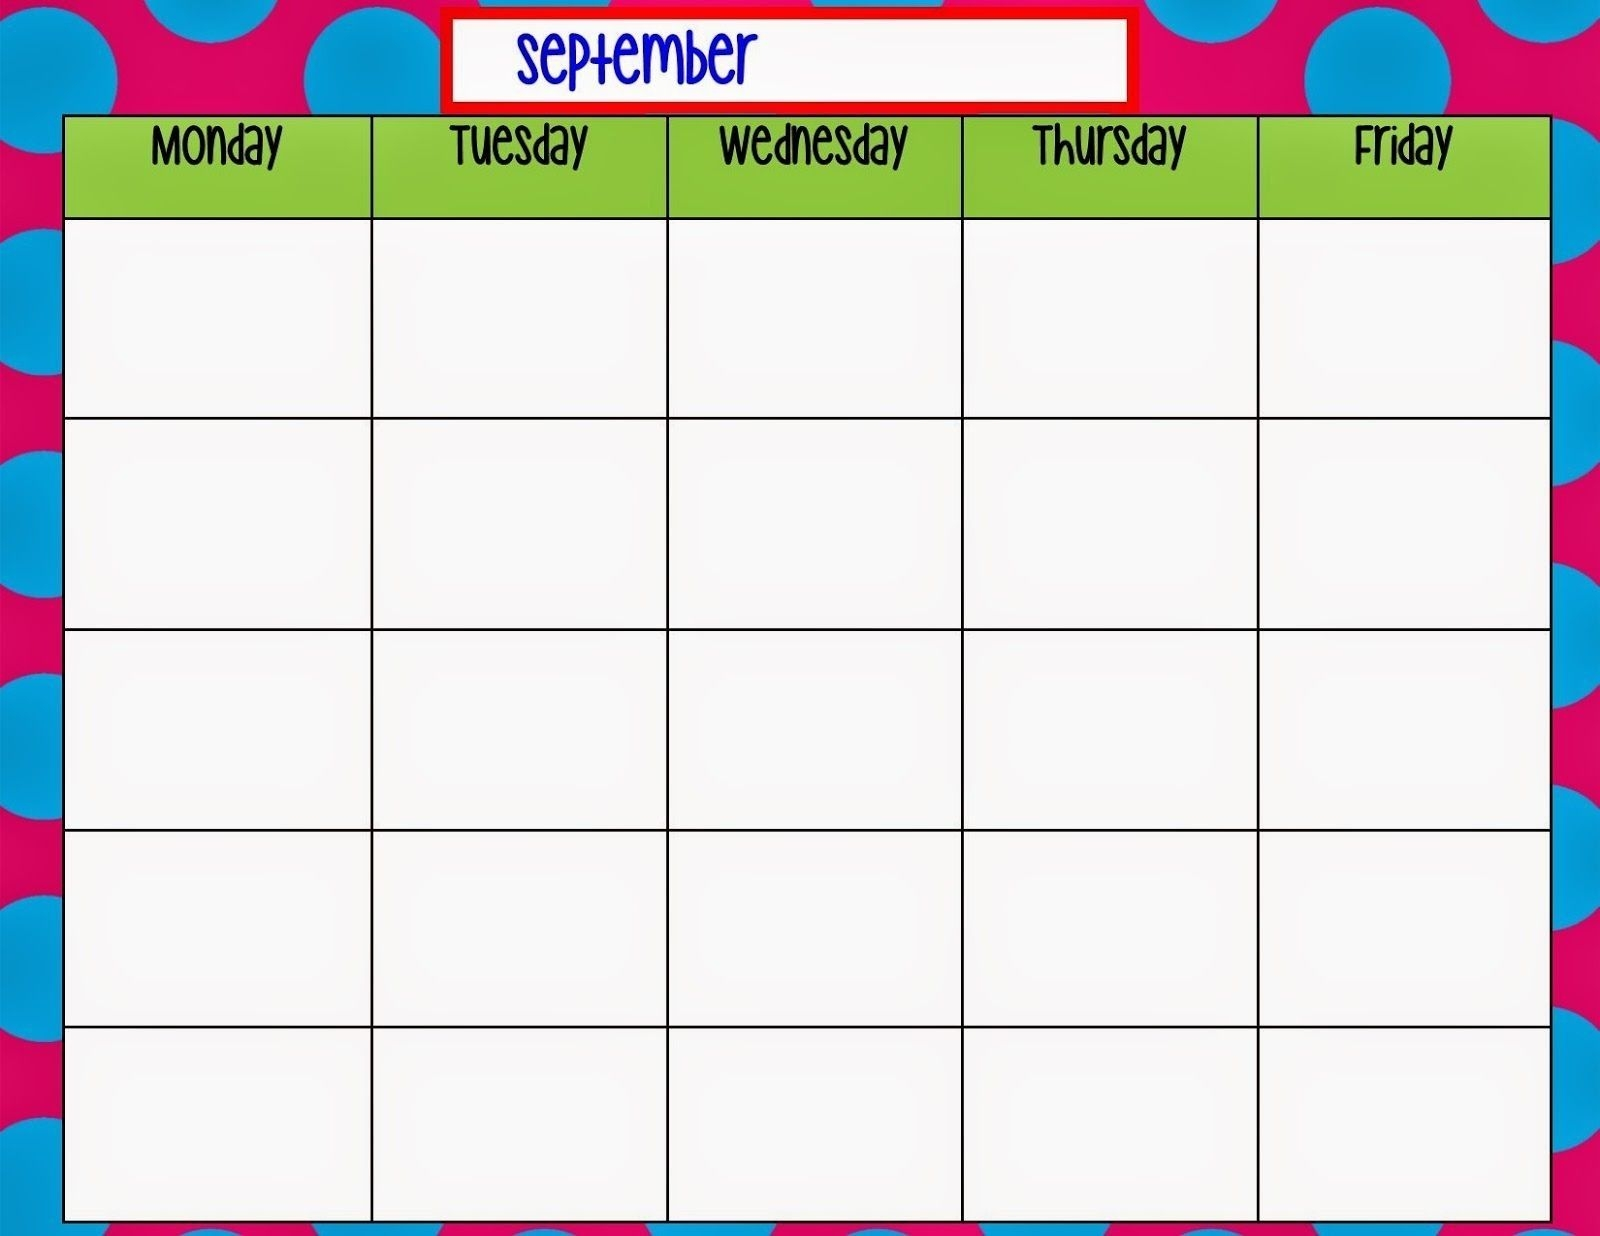 mon thru friday weekly blank calendar   calendar template